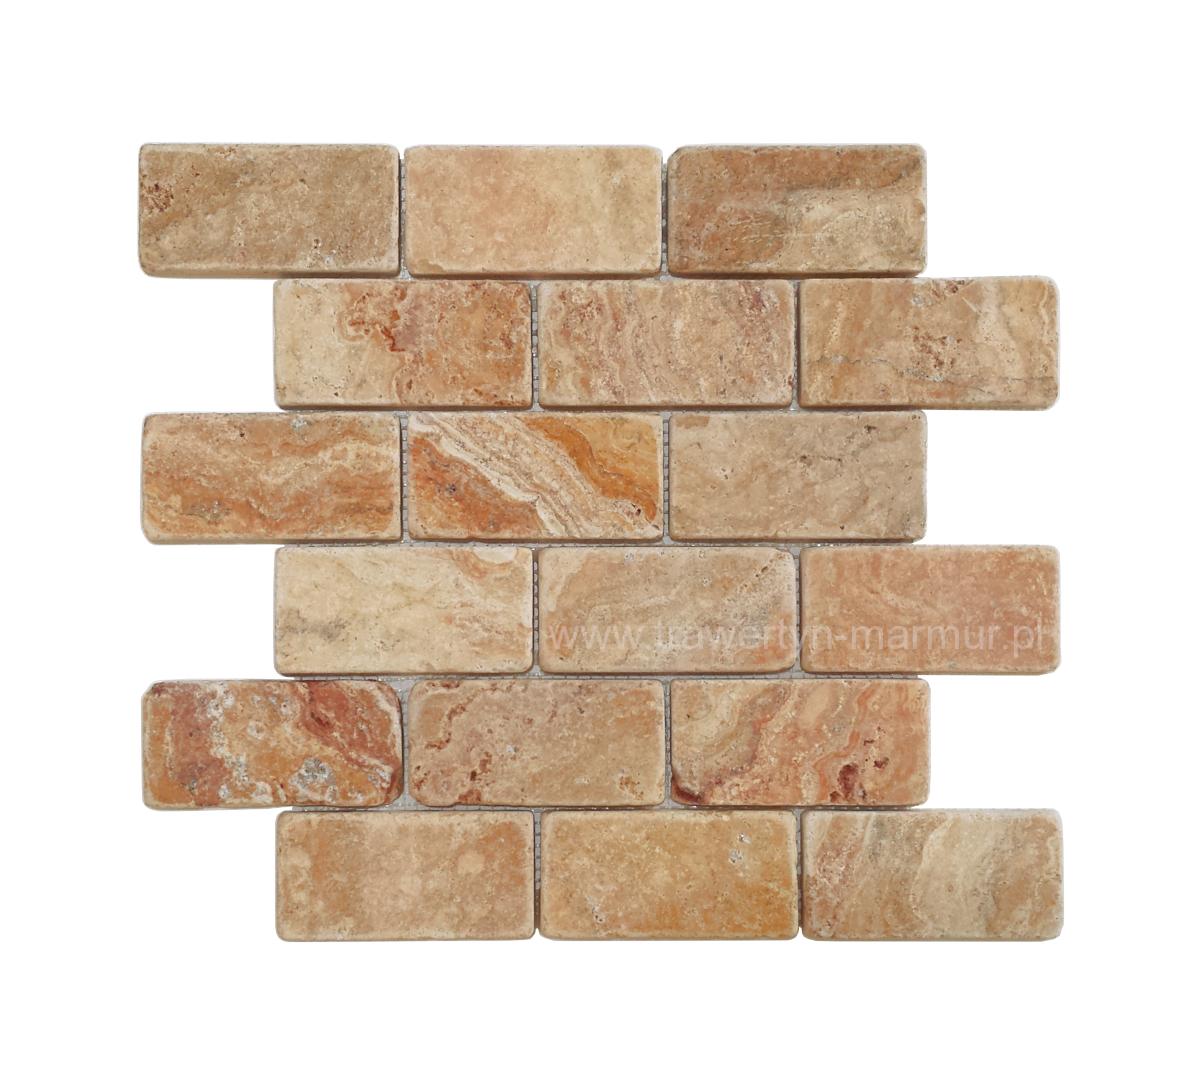 Mozaika kamienna trawertynowa Yellow Tumbled 5cm x 10cm